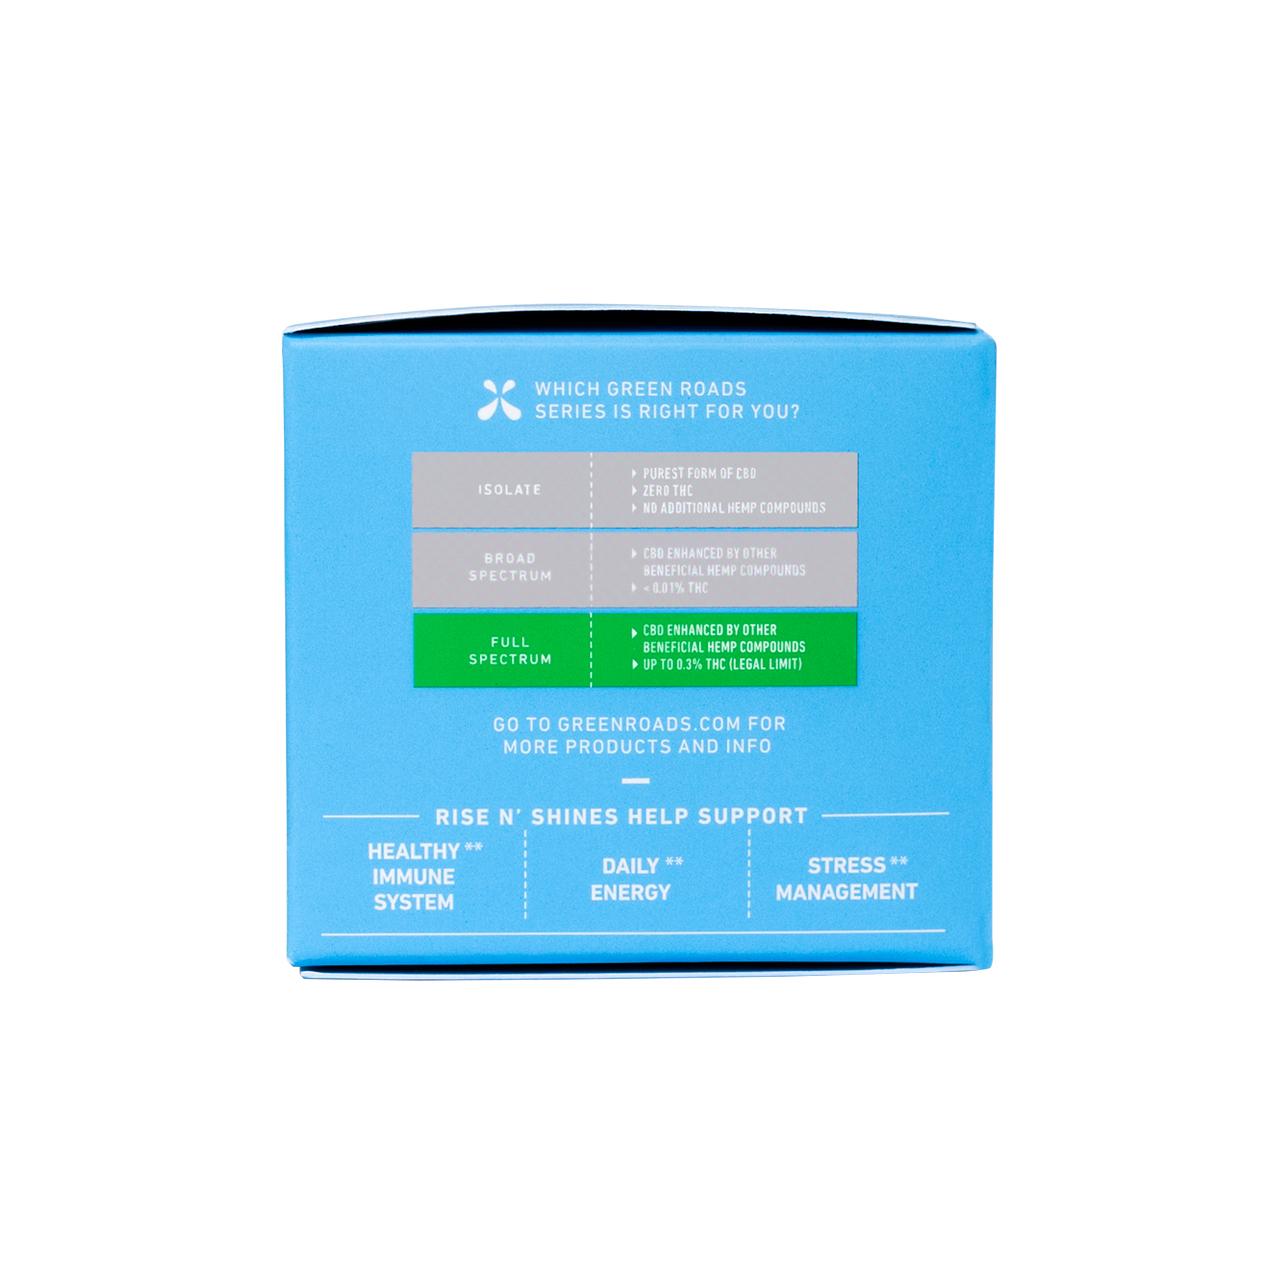 Green Roads, Rise N' Shines Immune Support CBD Gummies, Full Spectrum, 30ct, 750mg CBD 5